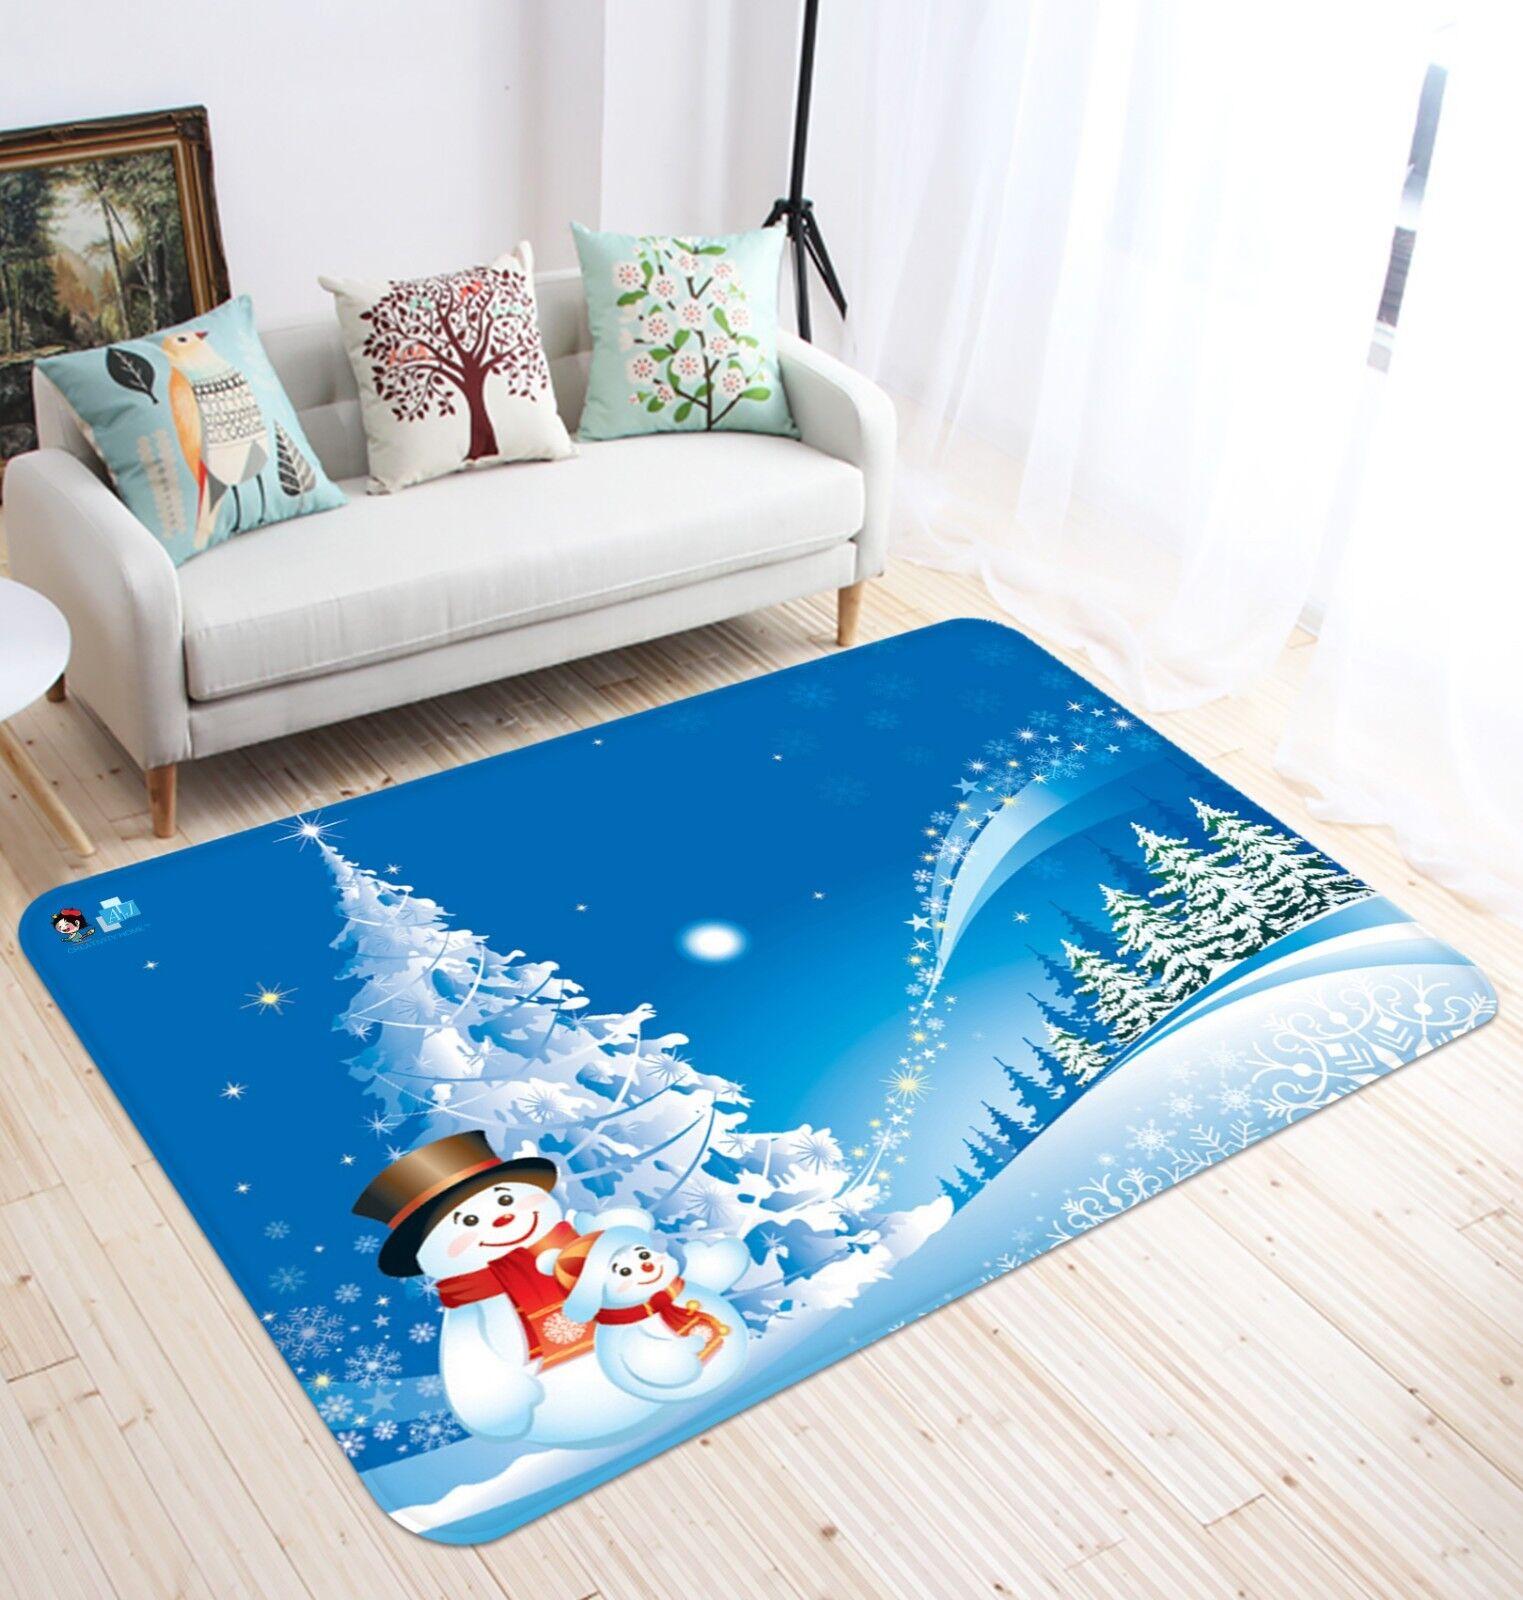 3D Natale Xmas 292 tappetino antiscivolo tappeto camera Tappetino Qualità Elegante foto Tappeto UK